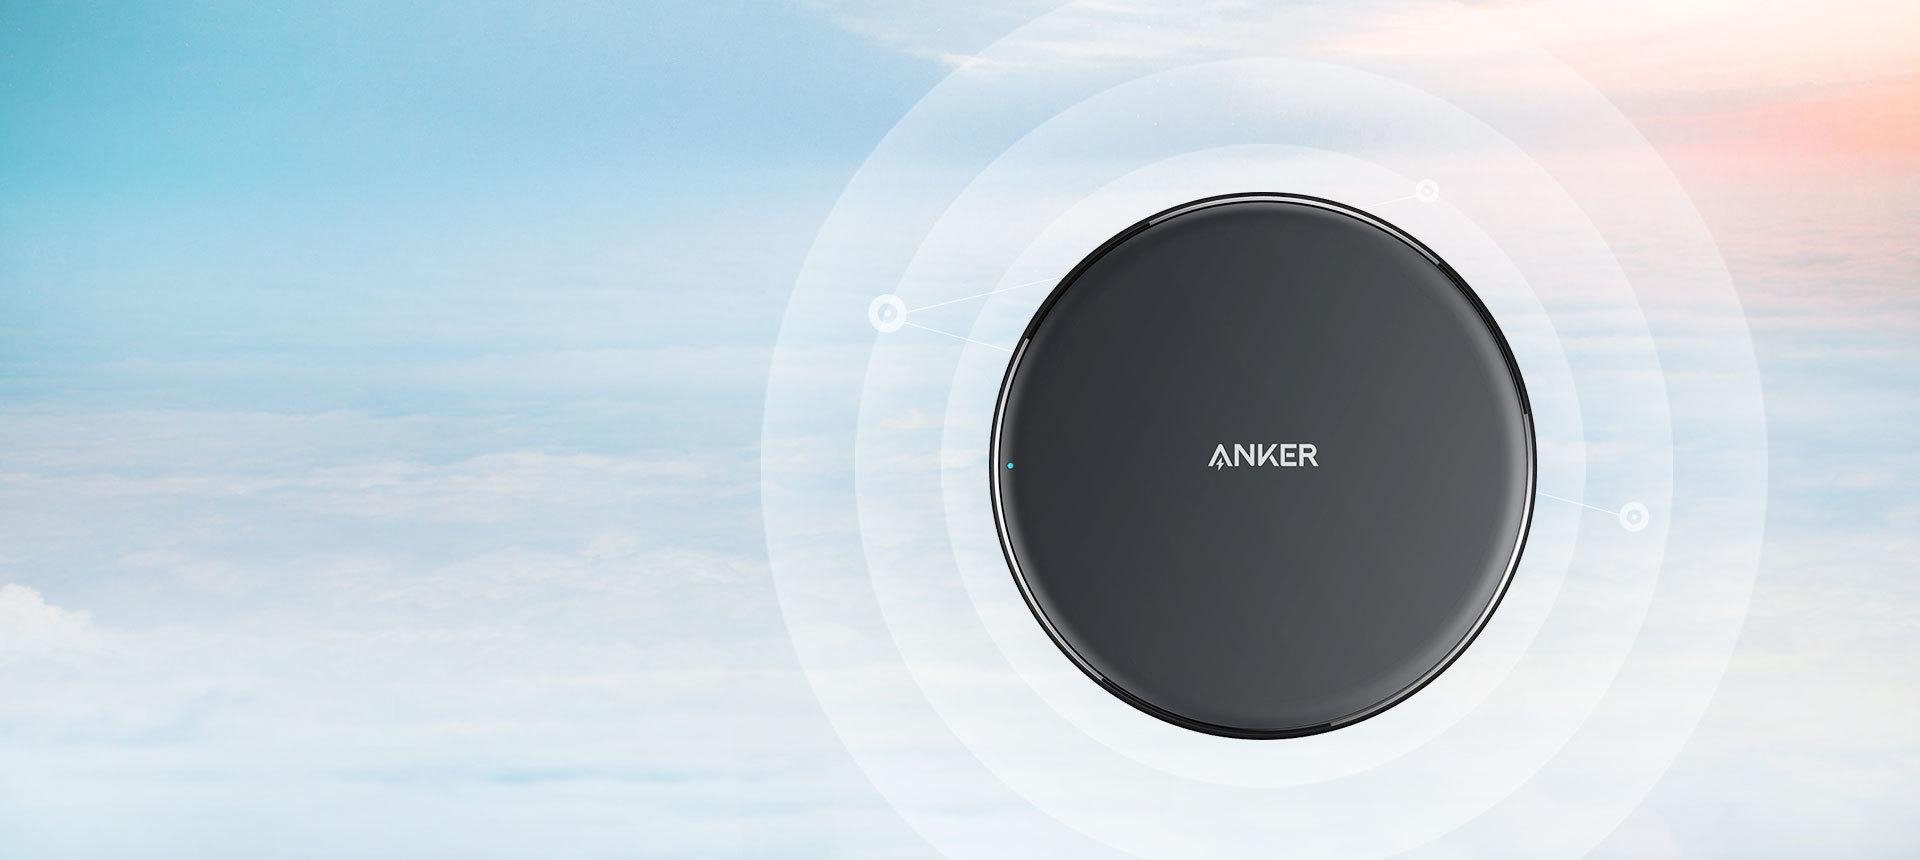 anker powercore 10000 manual pdf